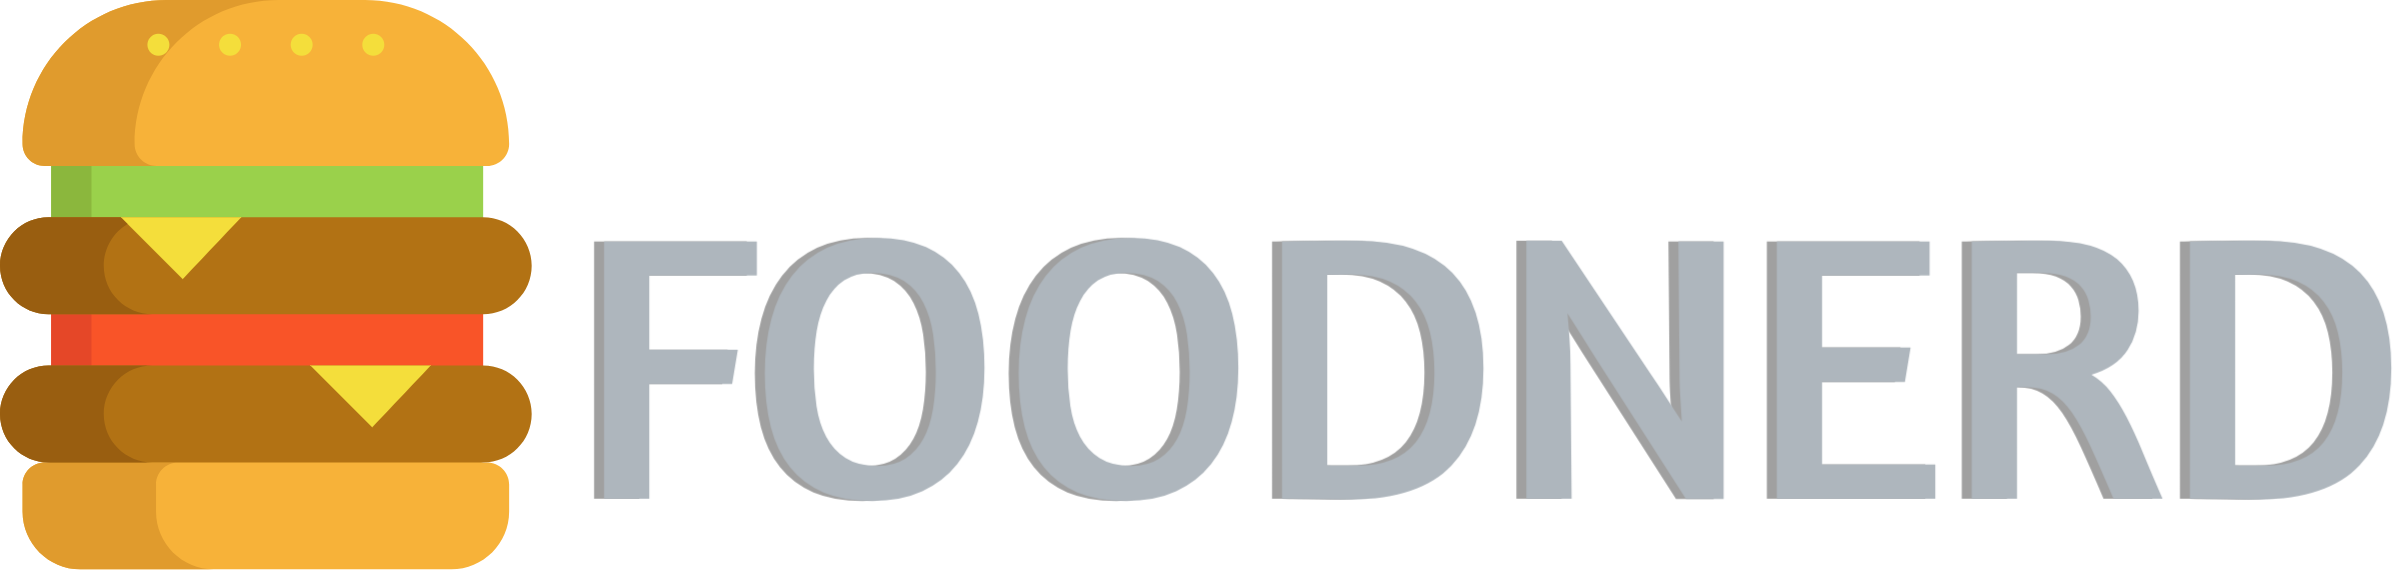 FoodNerd.dk